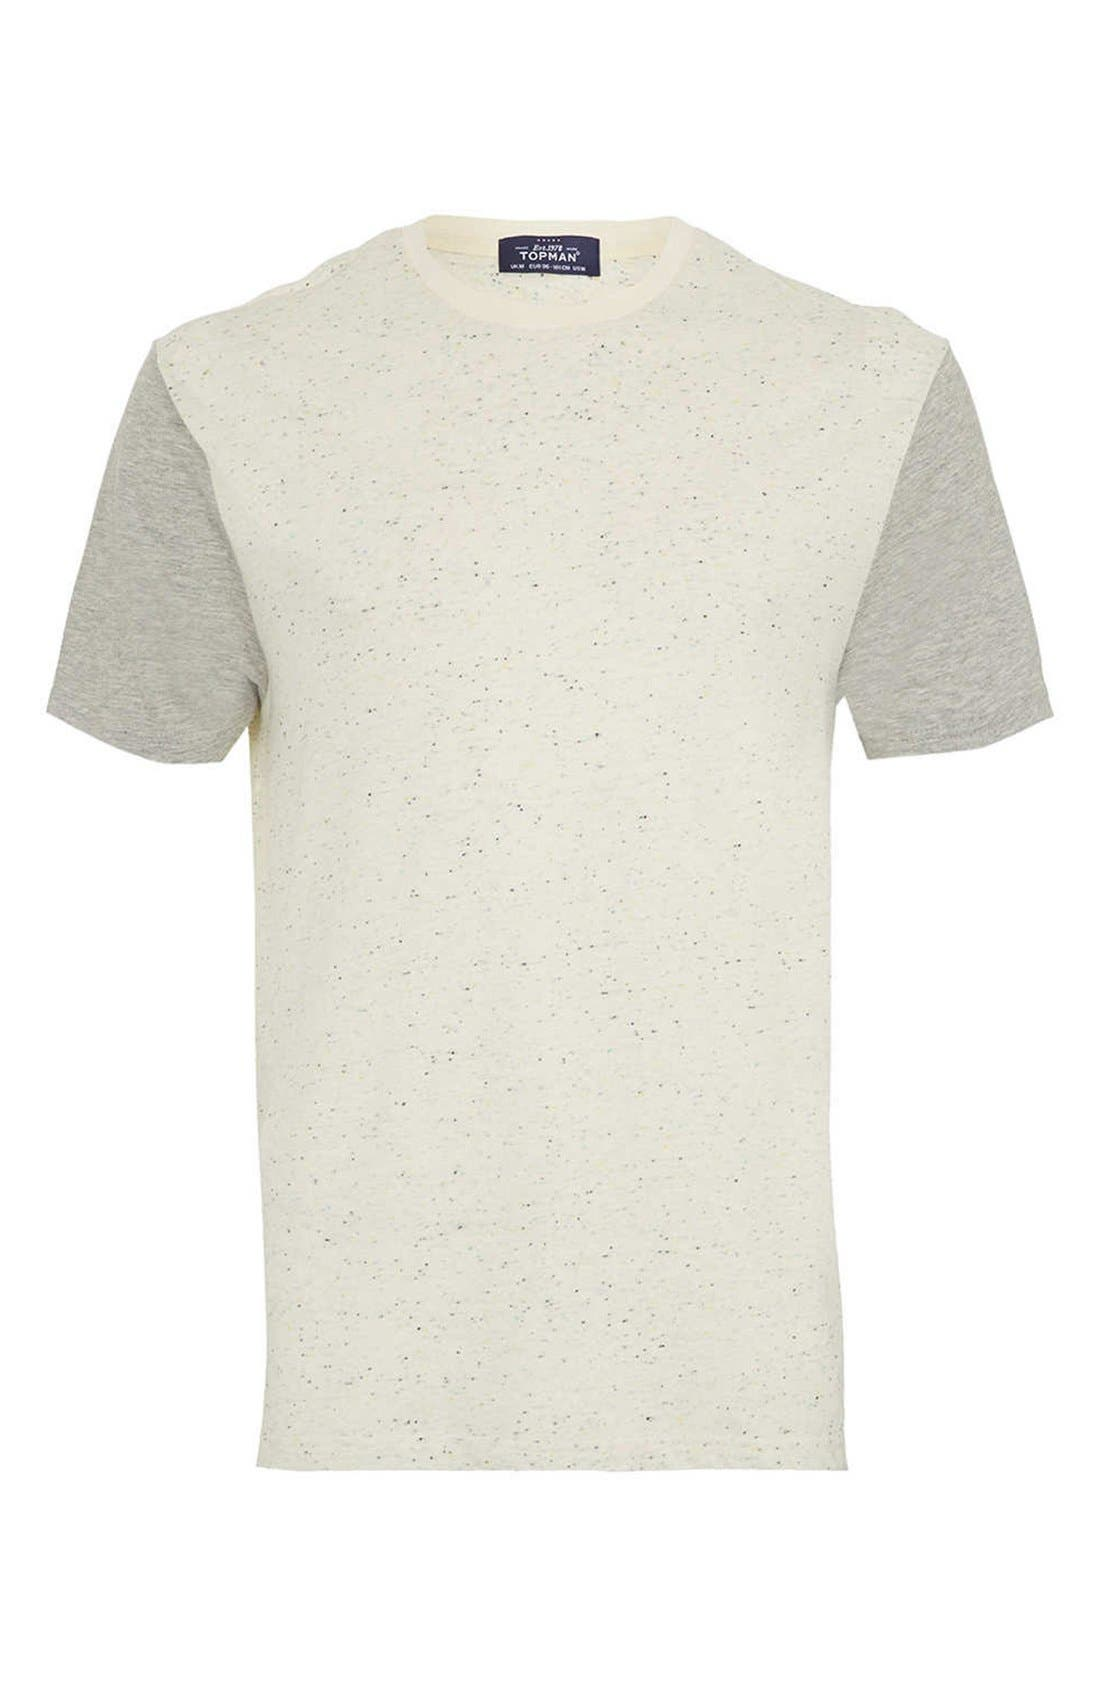 Alternate Image 1 Selected - Topman Nep Contrast T-Shirt